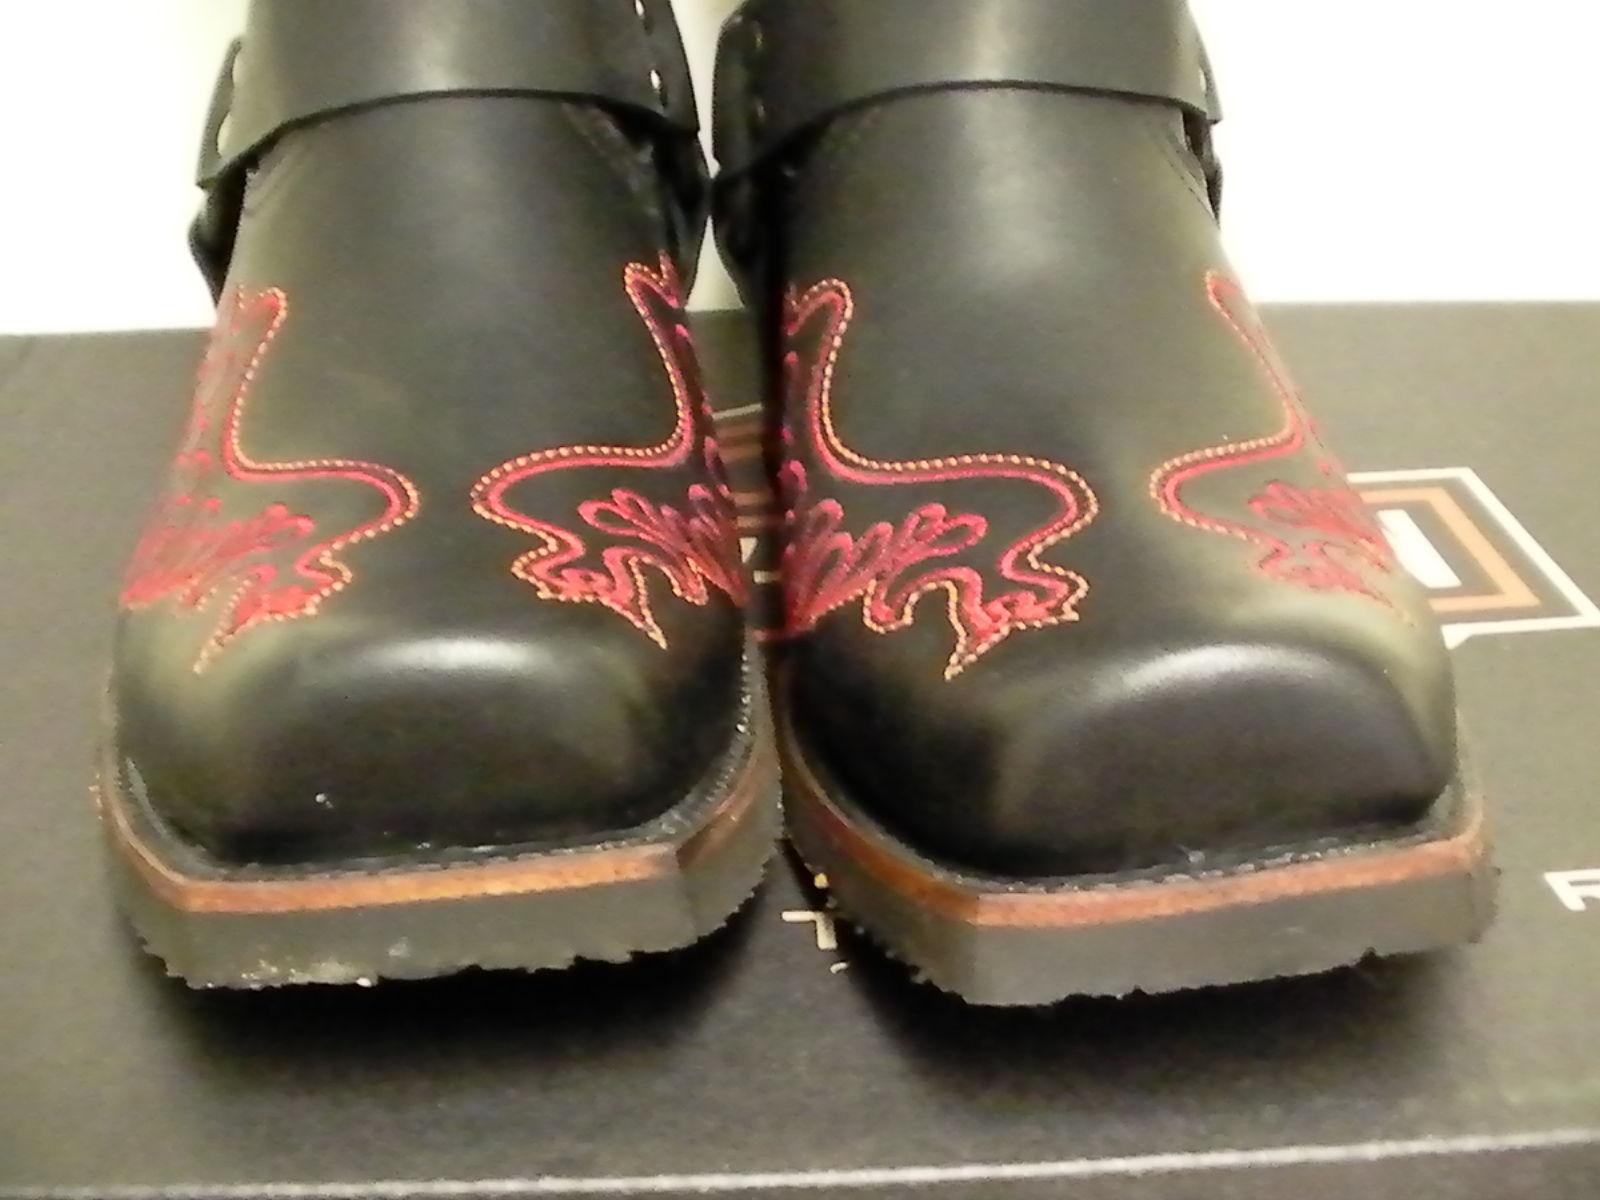 7b2066e6b3f1 Harley davidson boots slayton riding oil resisting size 10 us D 93141 new